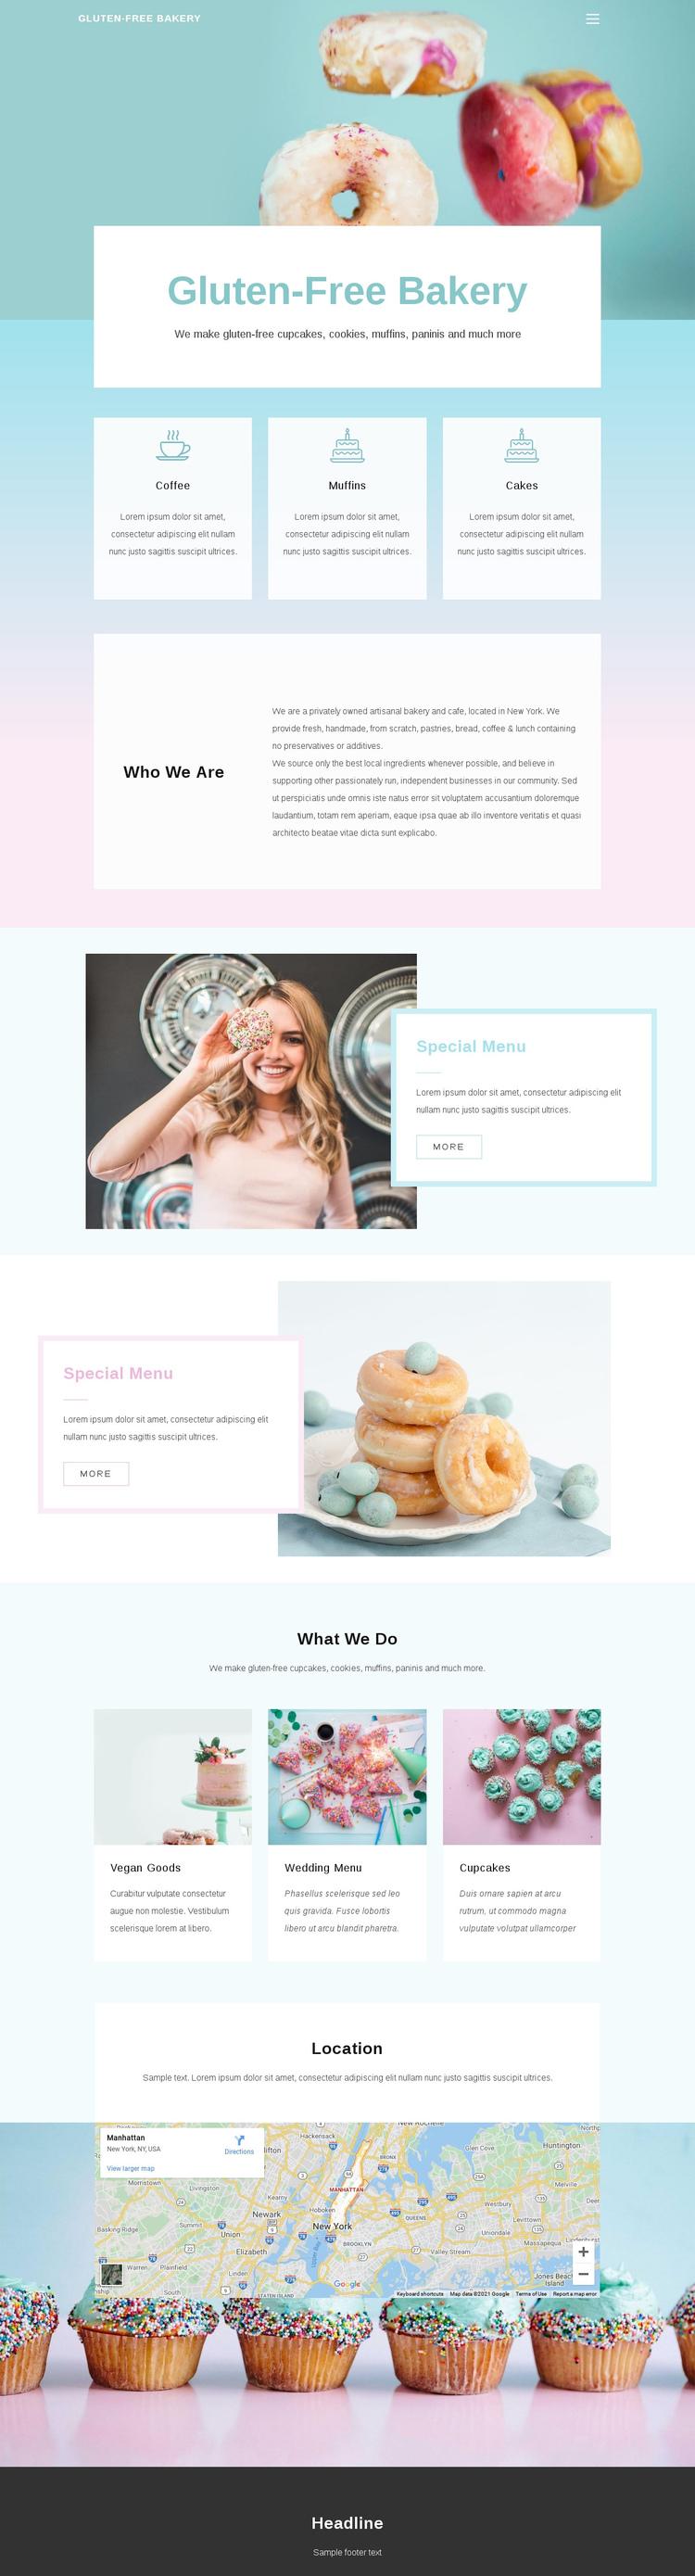 Gluten-Free Backery Website Builder Software